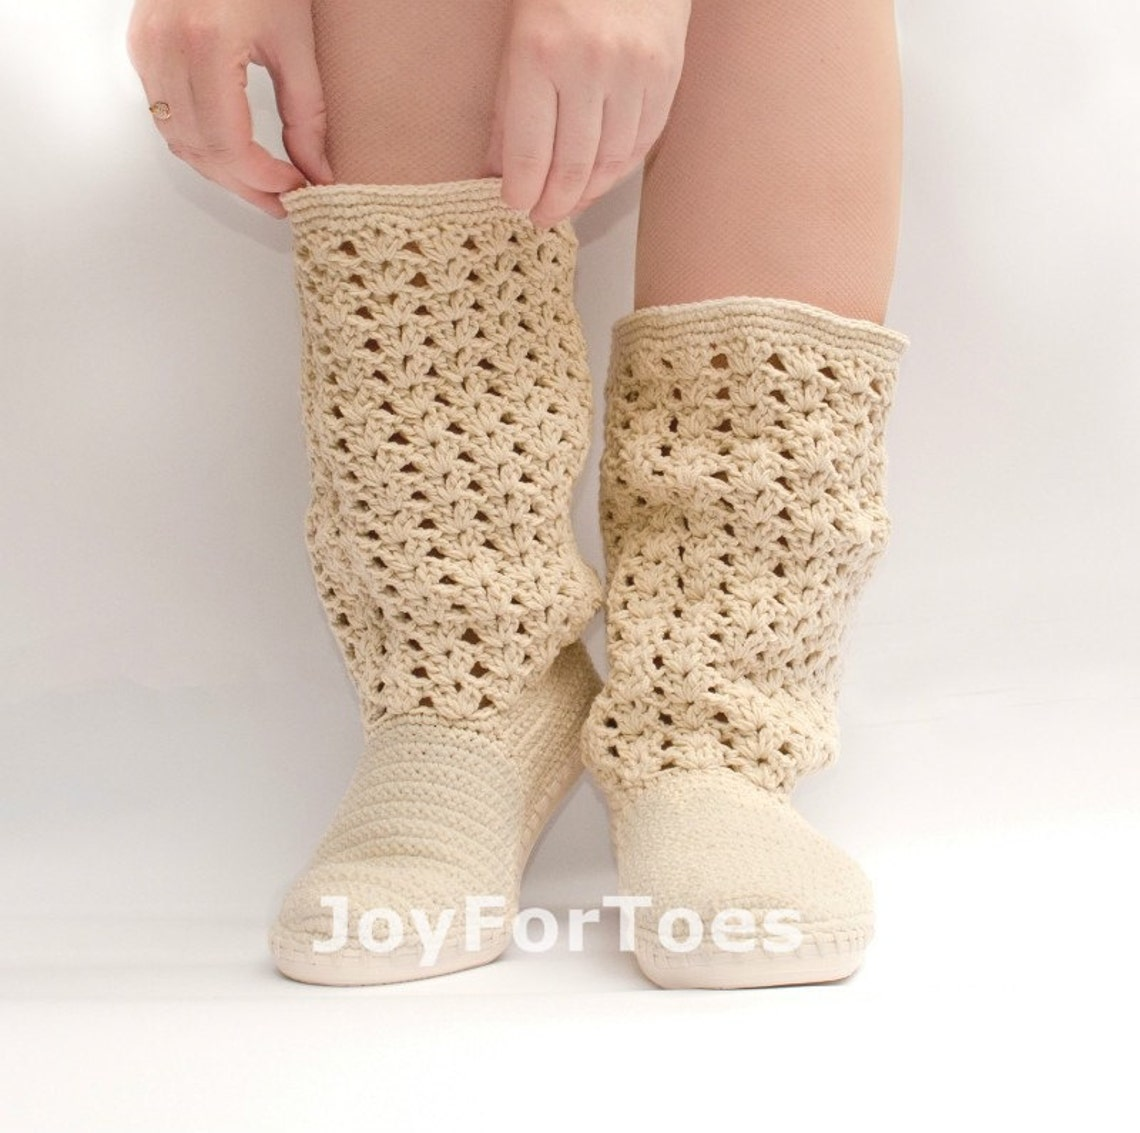 Ganchillo botas zapatos para el estilo Boho de calle mujer hizo orden de encaje botas